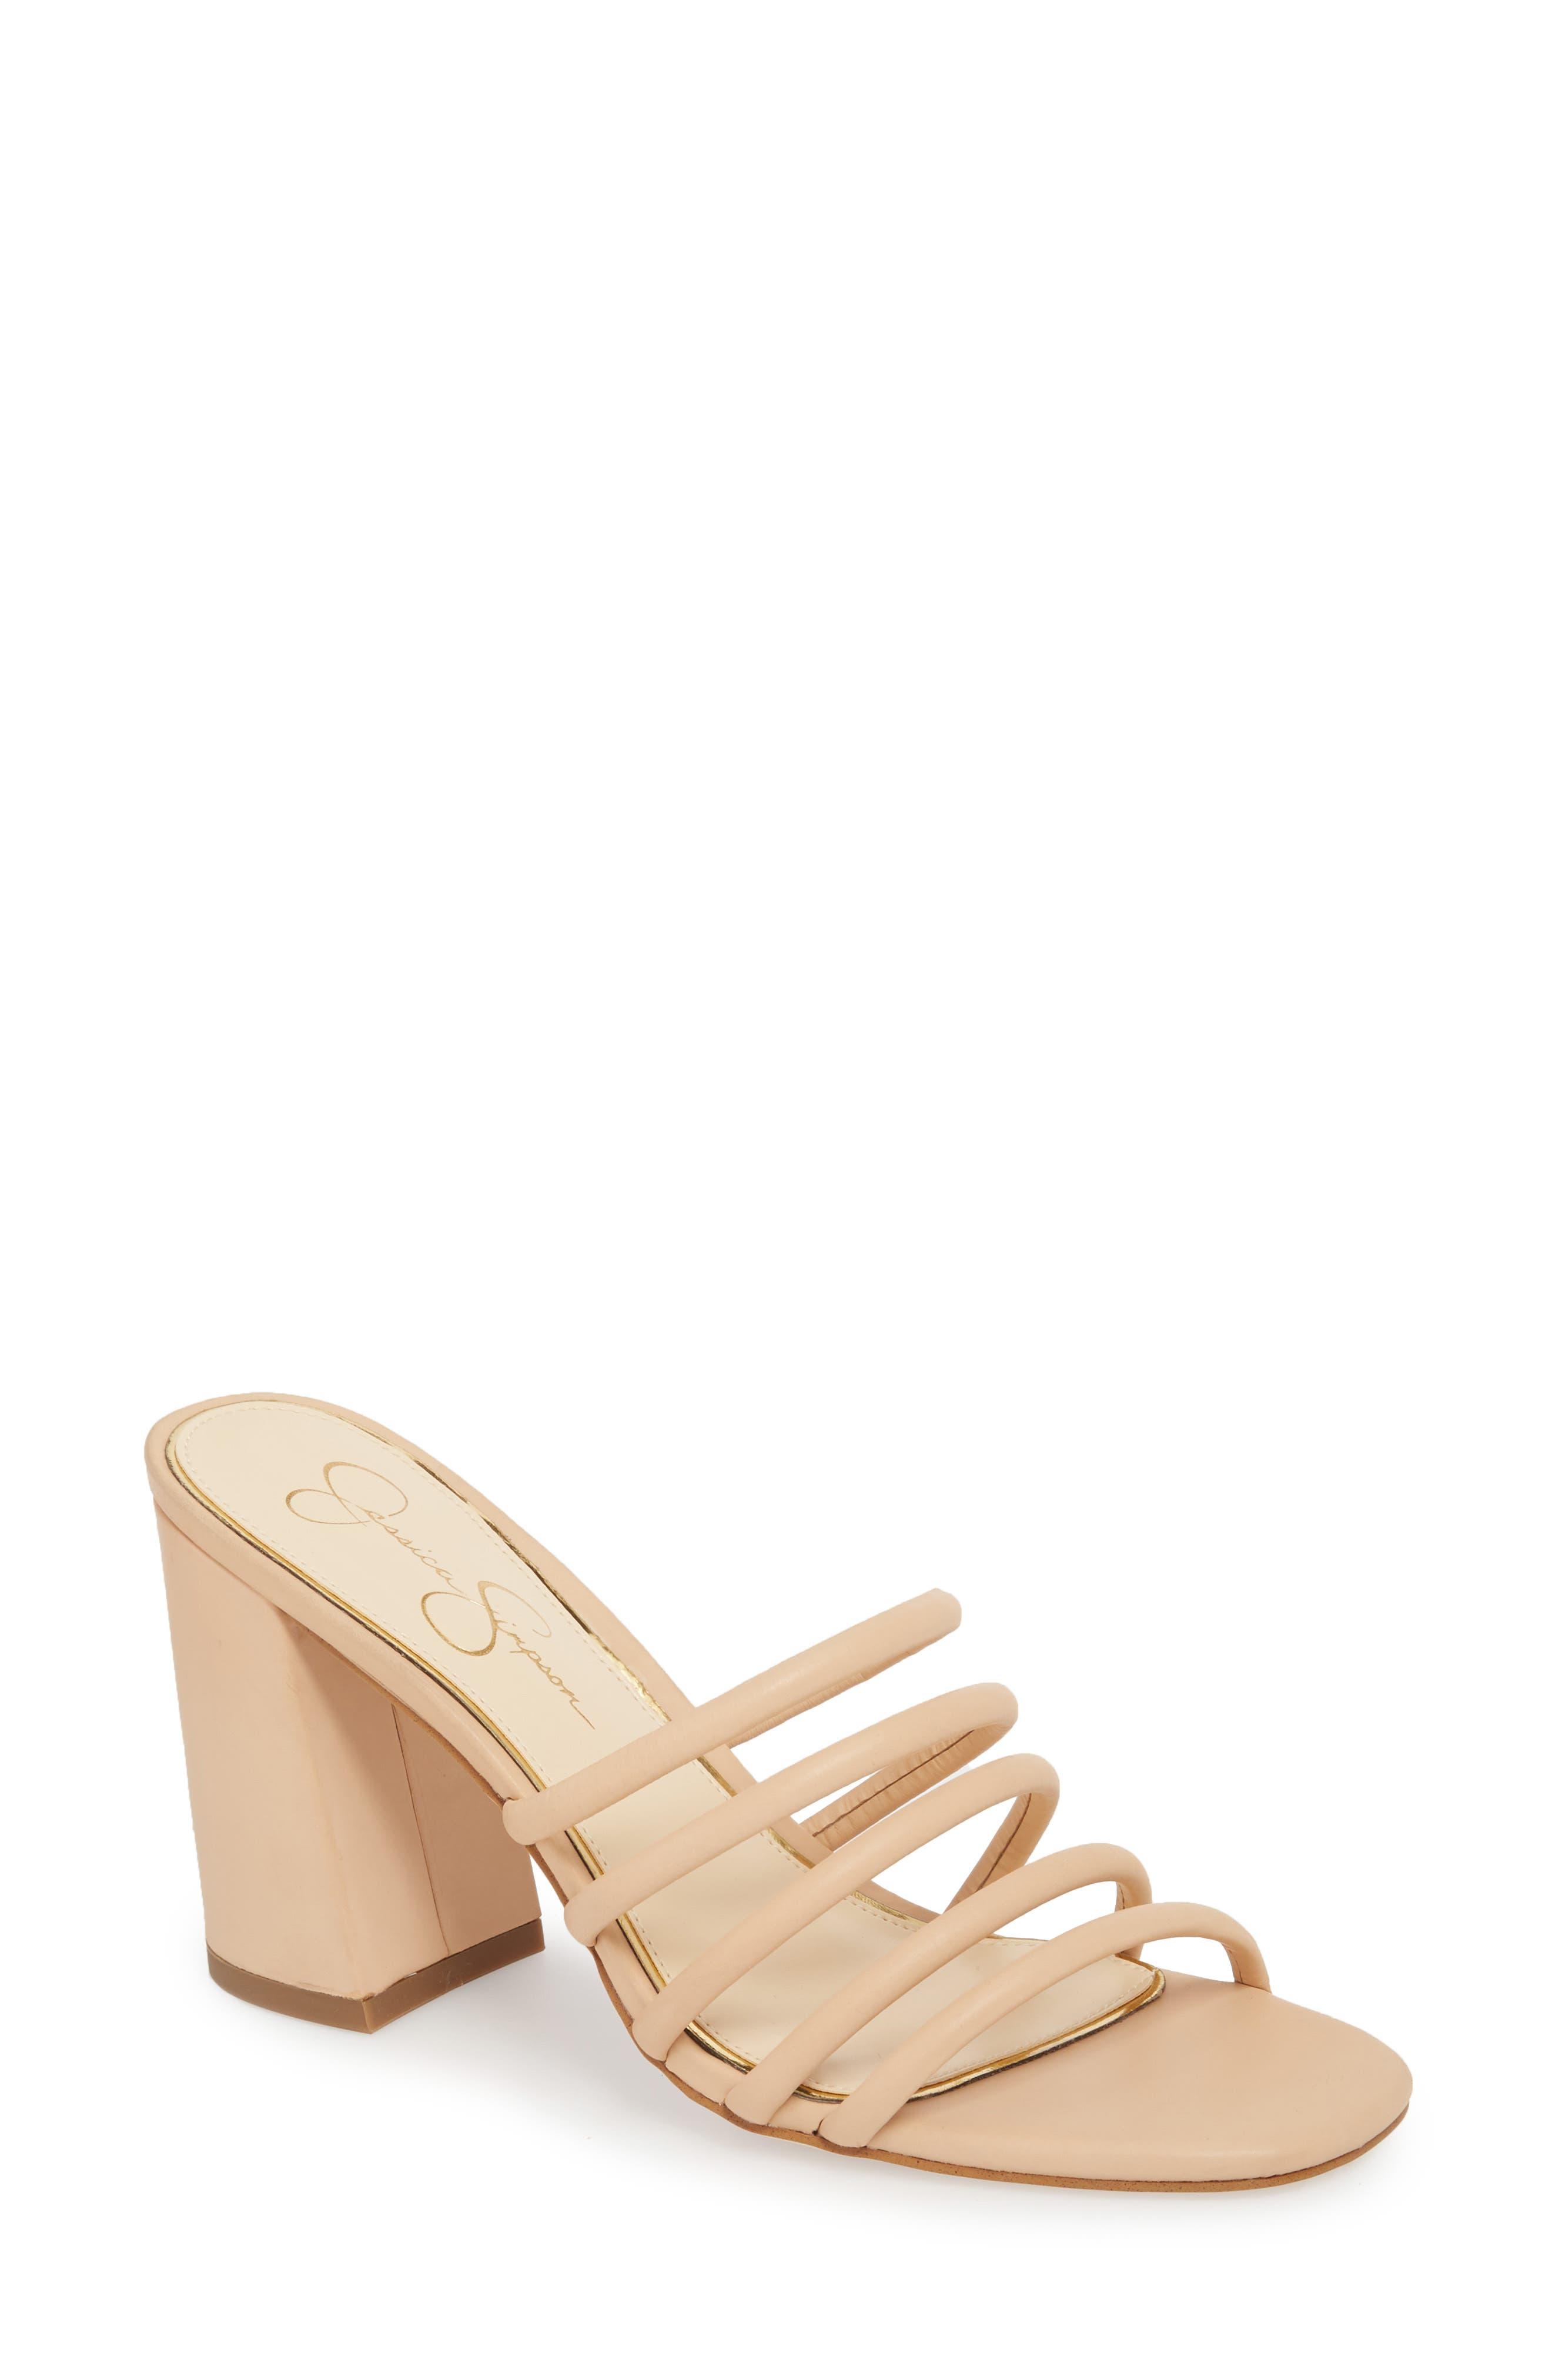 Fixton Strappy Slide Sandal,                         Main,                         color, 260